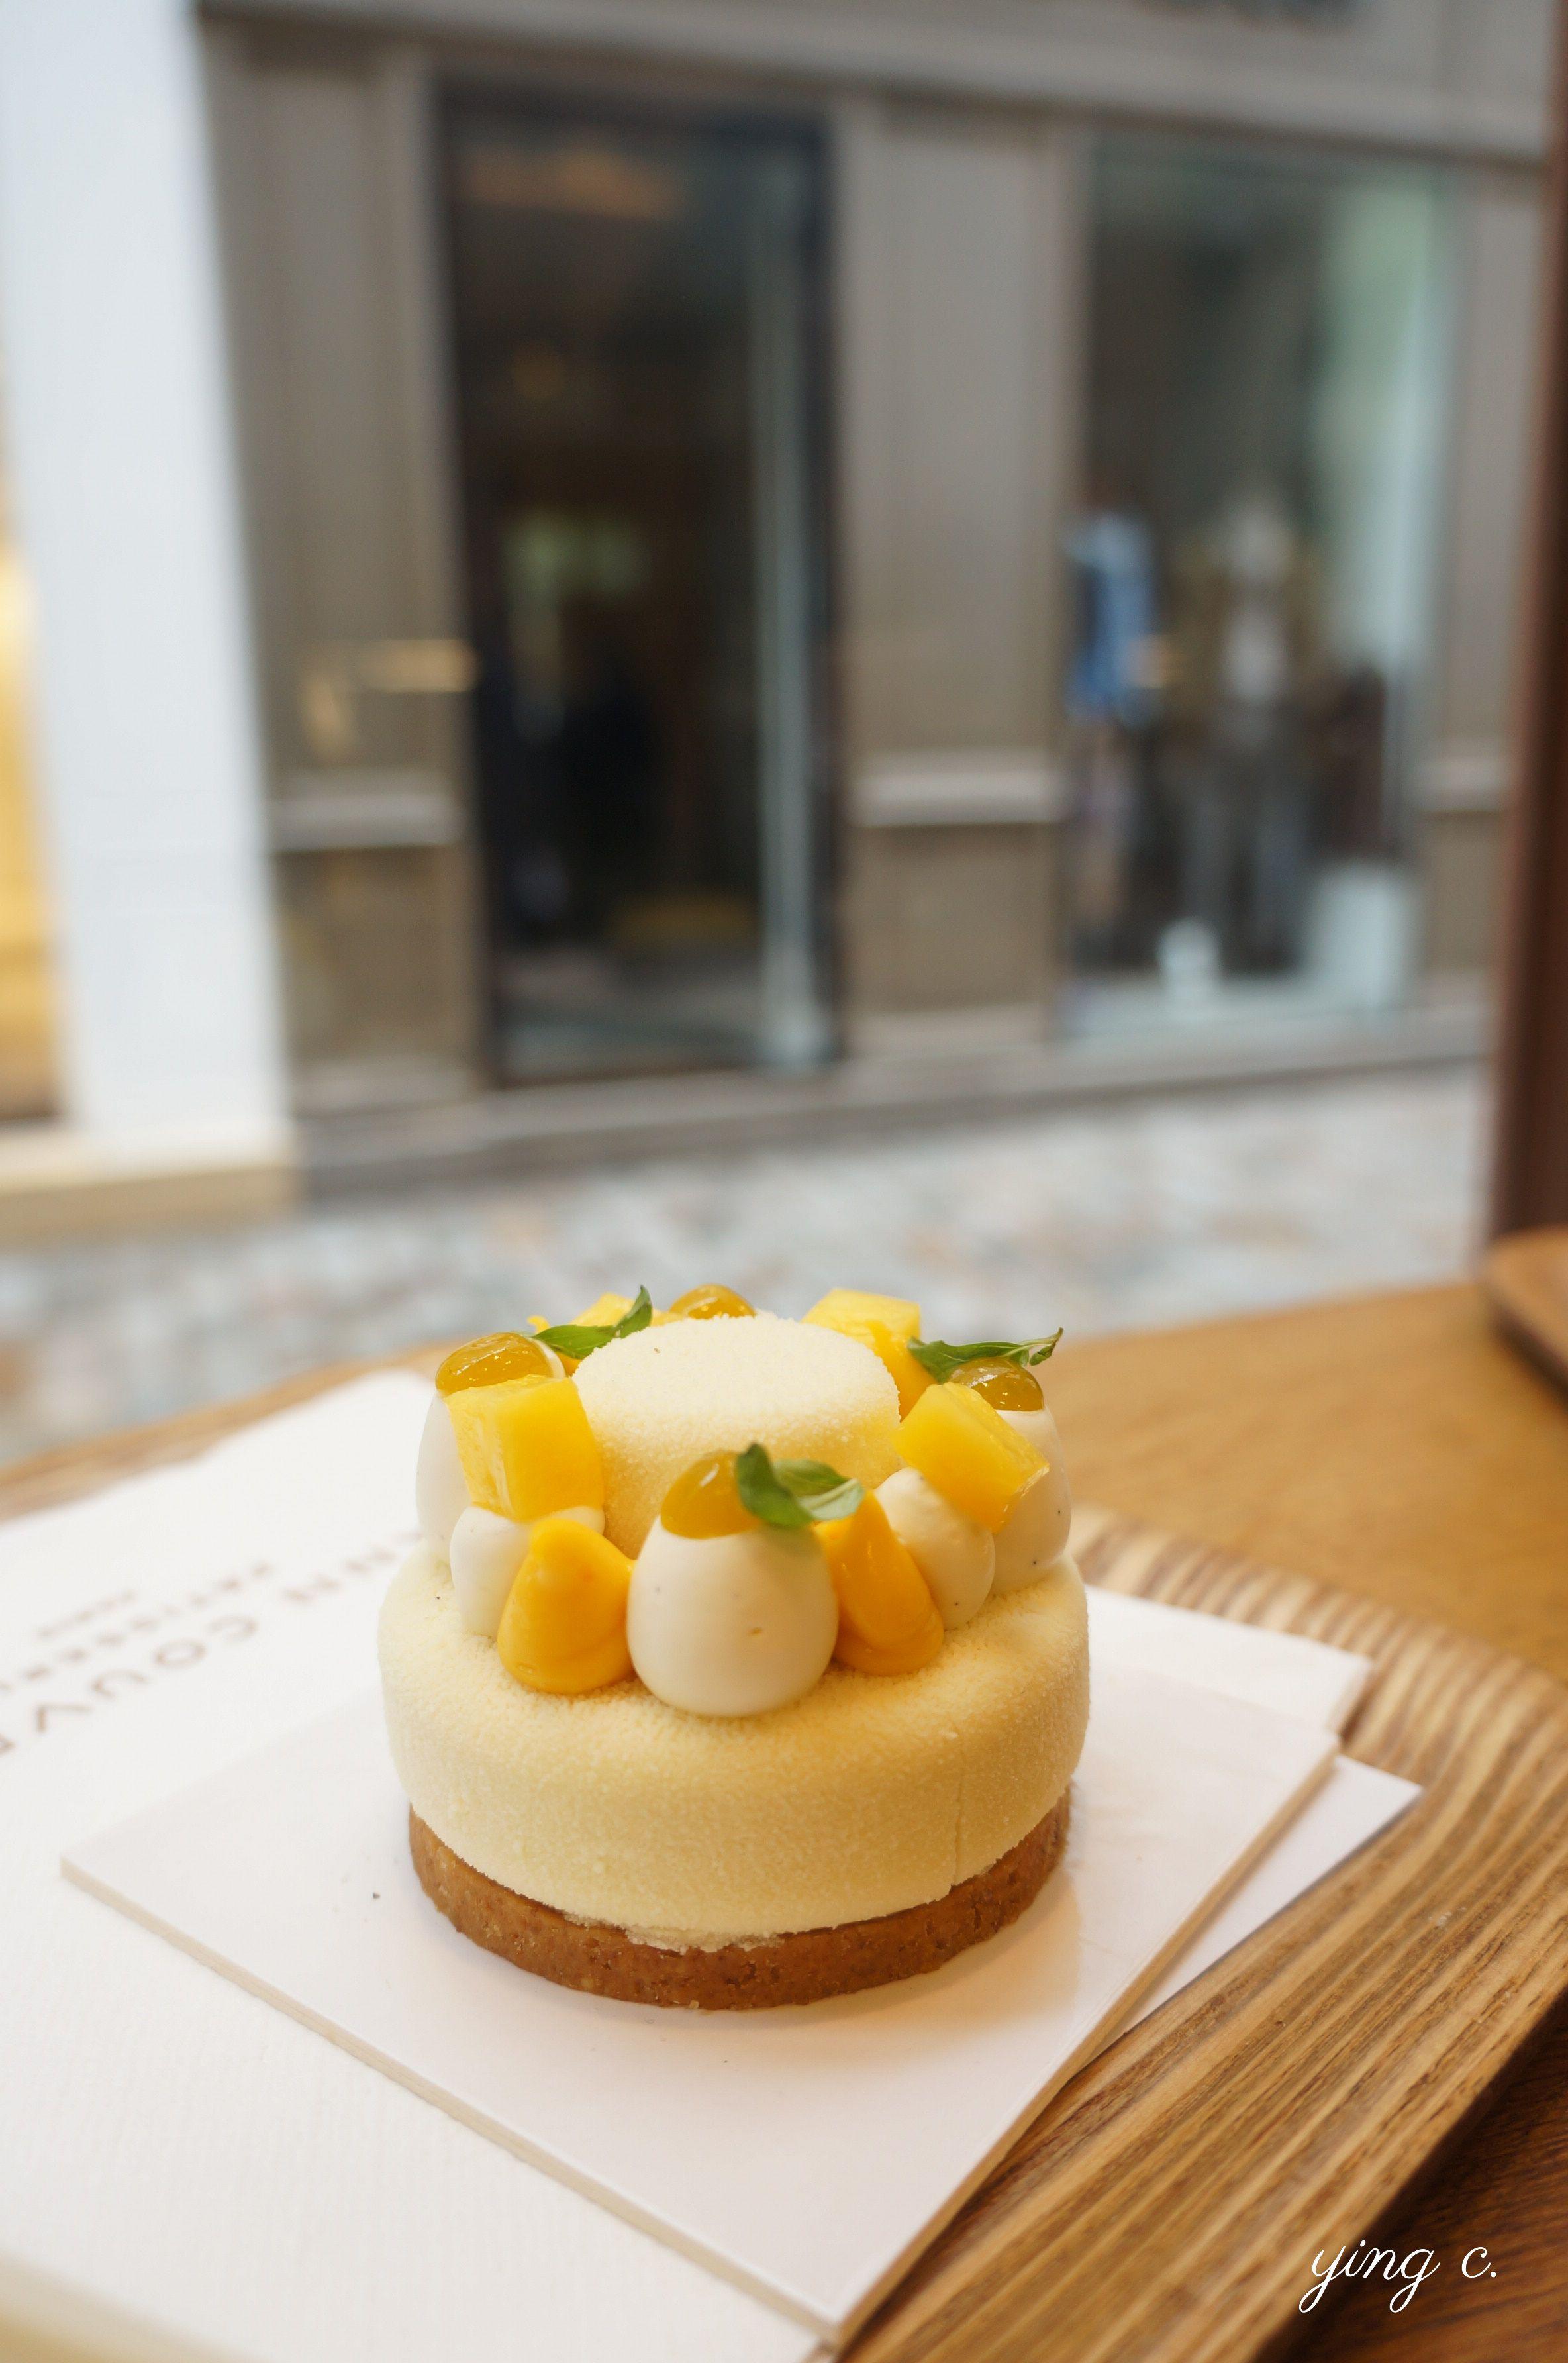 Yann Couvreur 主廚的茉莉花熱帶水果起司蛋糕( Cheesecake Jasmin / Fruits Exotiques )。